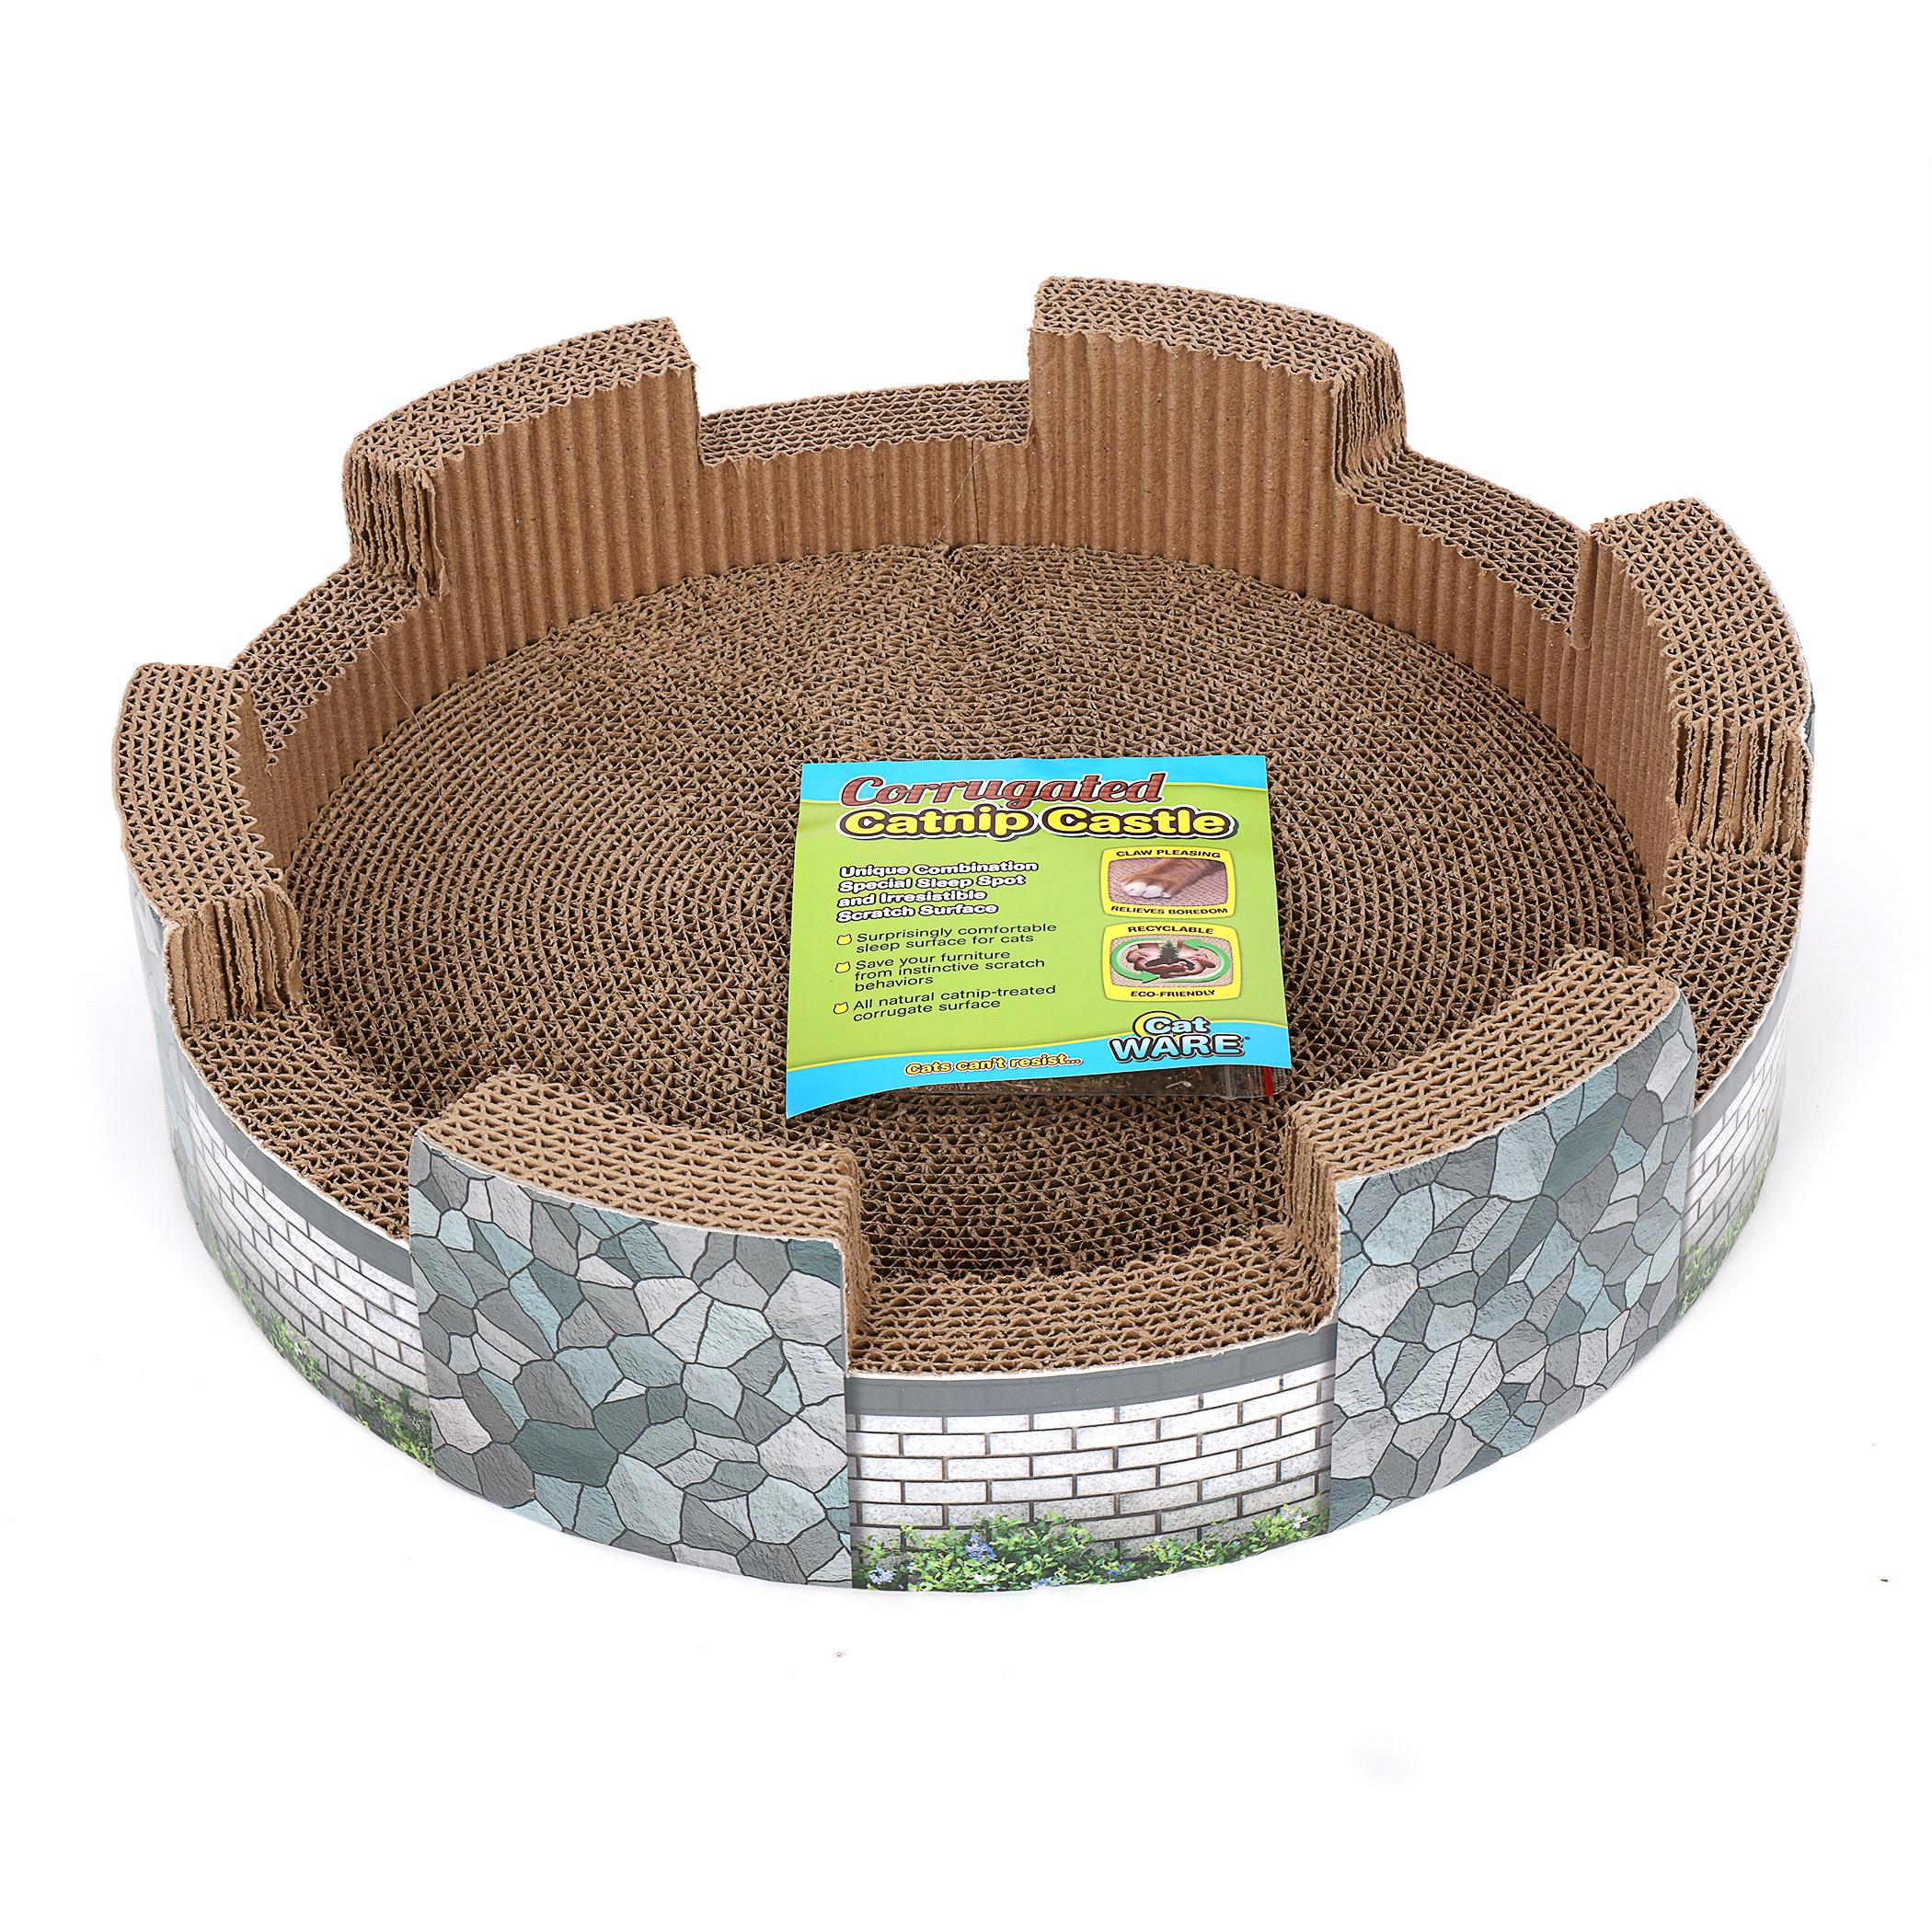 Corrugated Catnip Castle